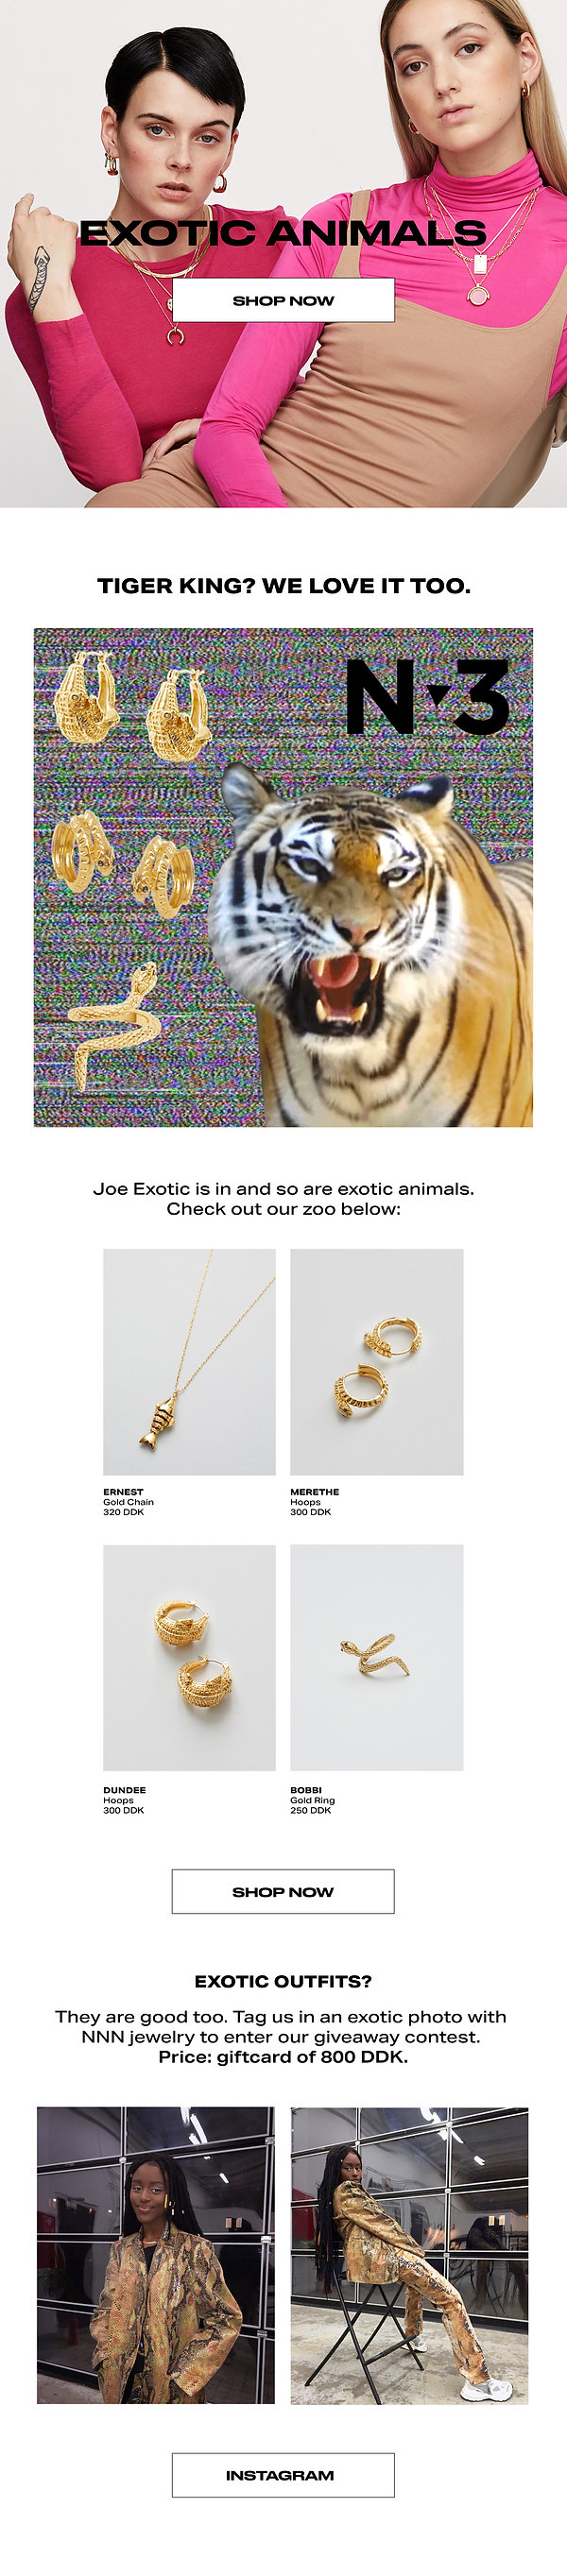 ExoticAnimals.jpg